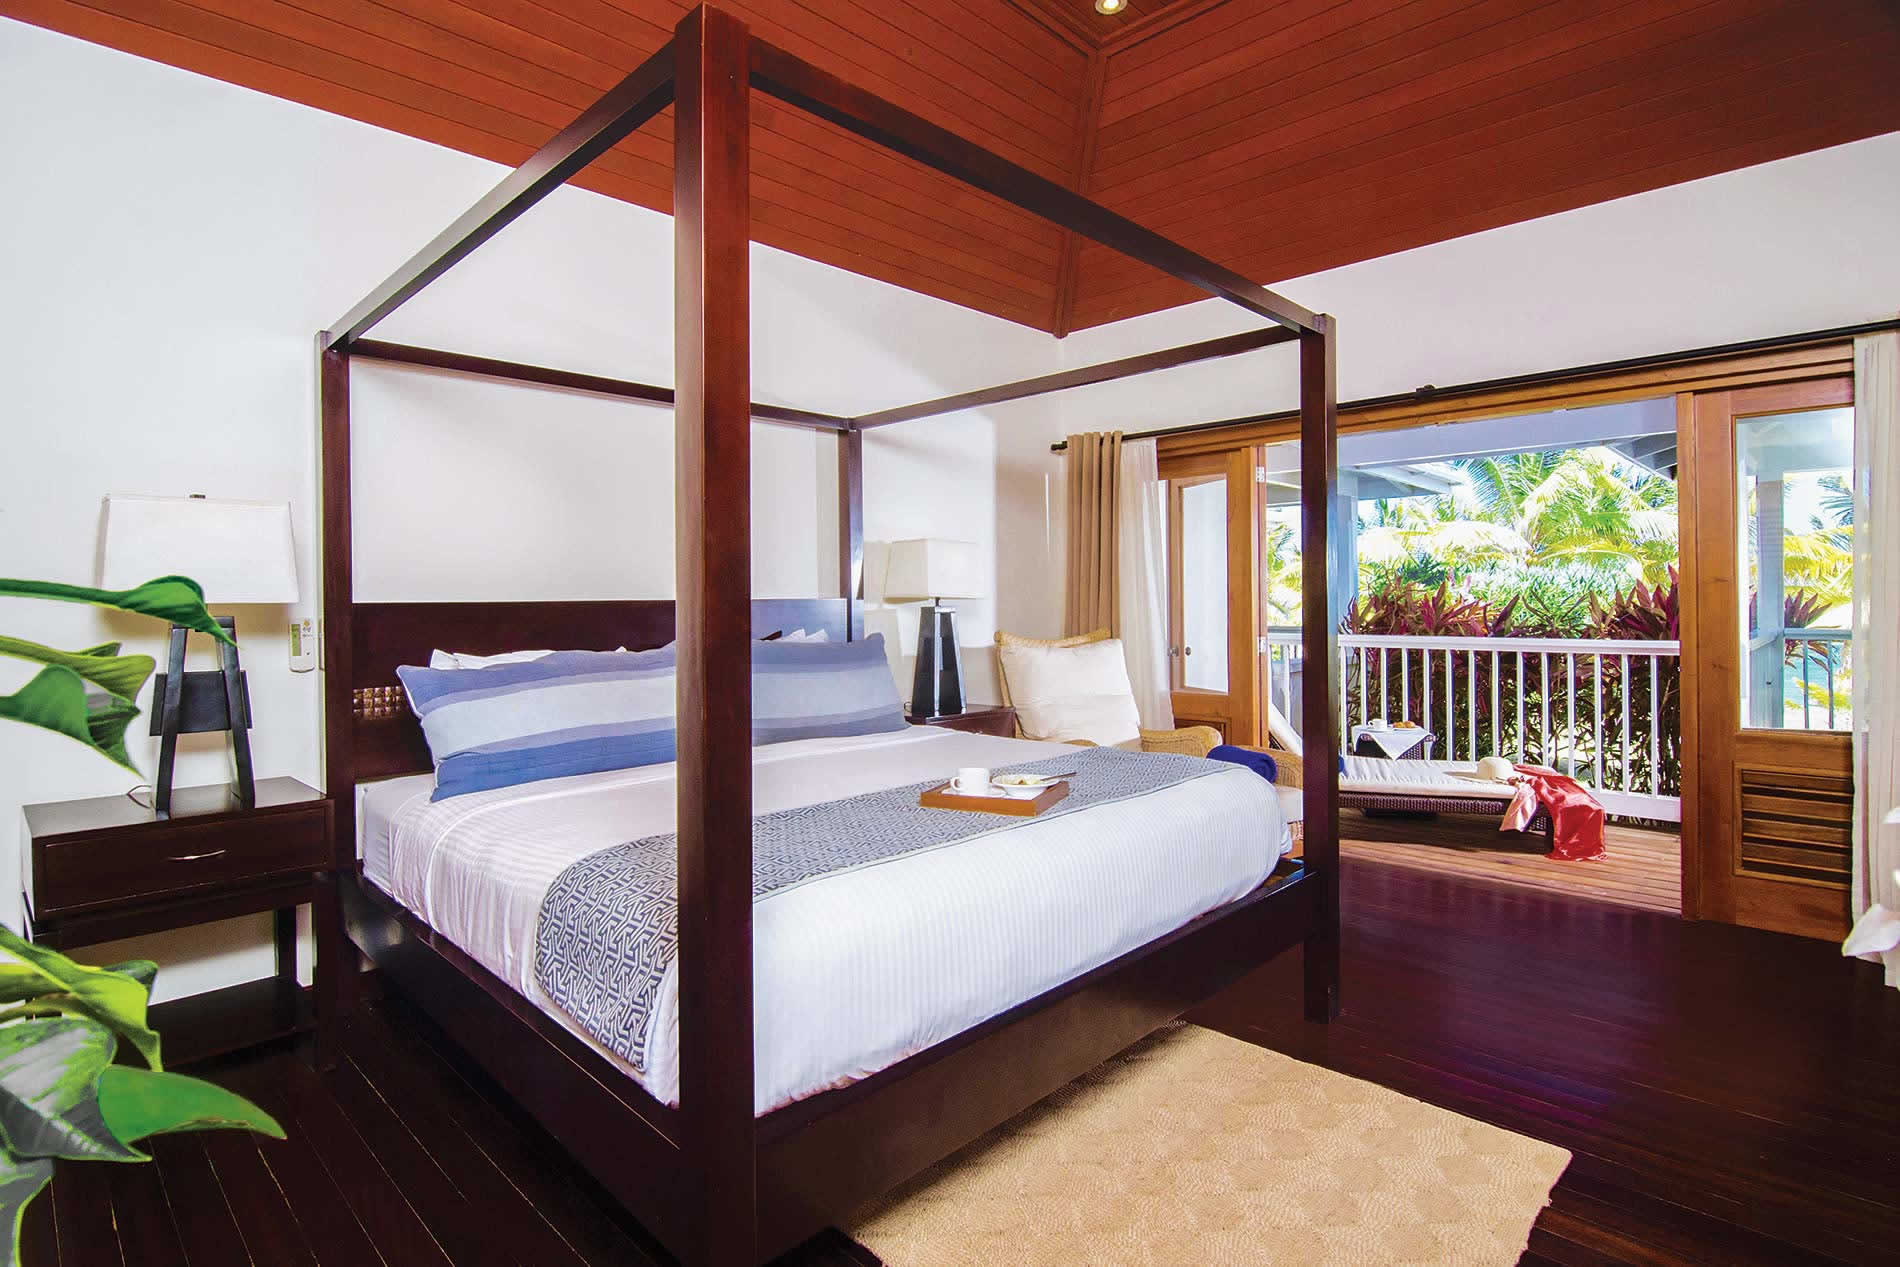 Apartment Premium Beachfront II in Nonsuch Bay Resort - sleeps 4 people